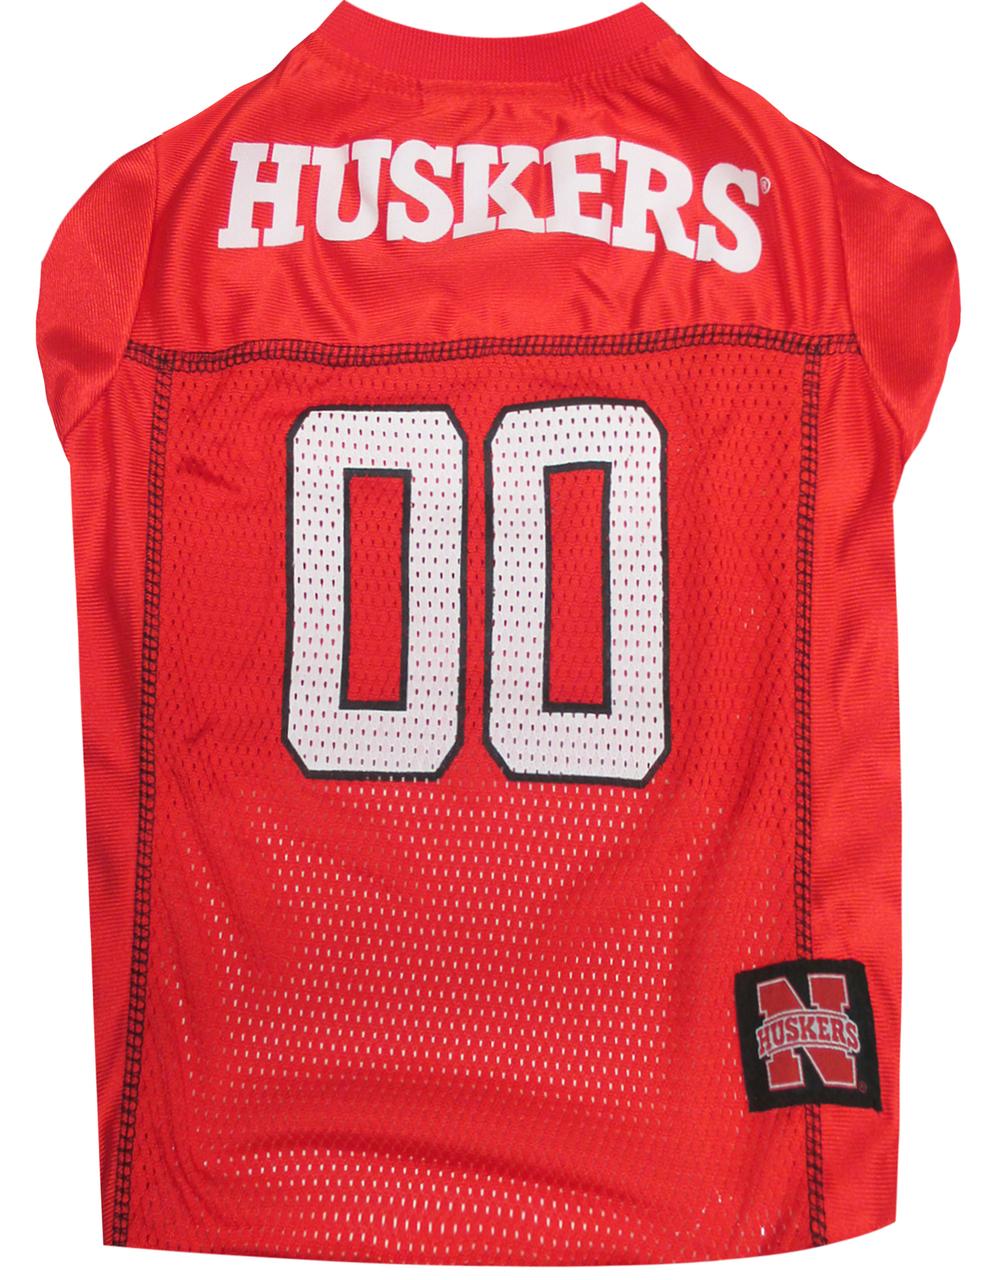 Hot Dog Nebraska Football Dog Jersey